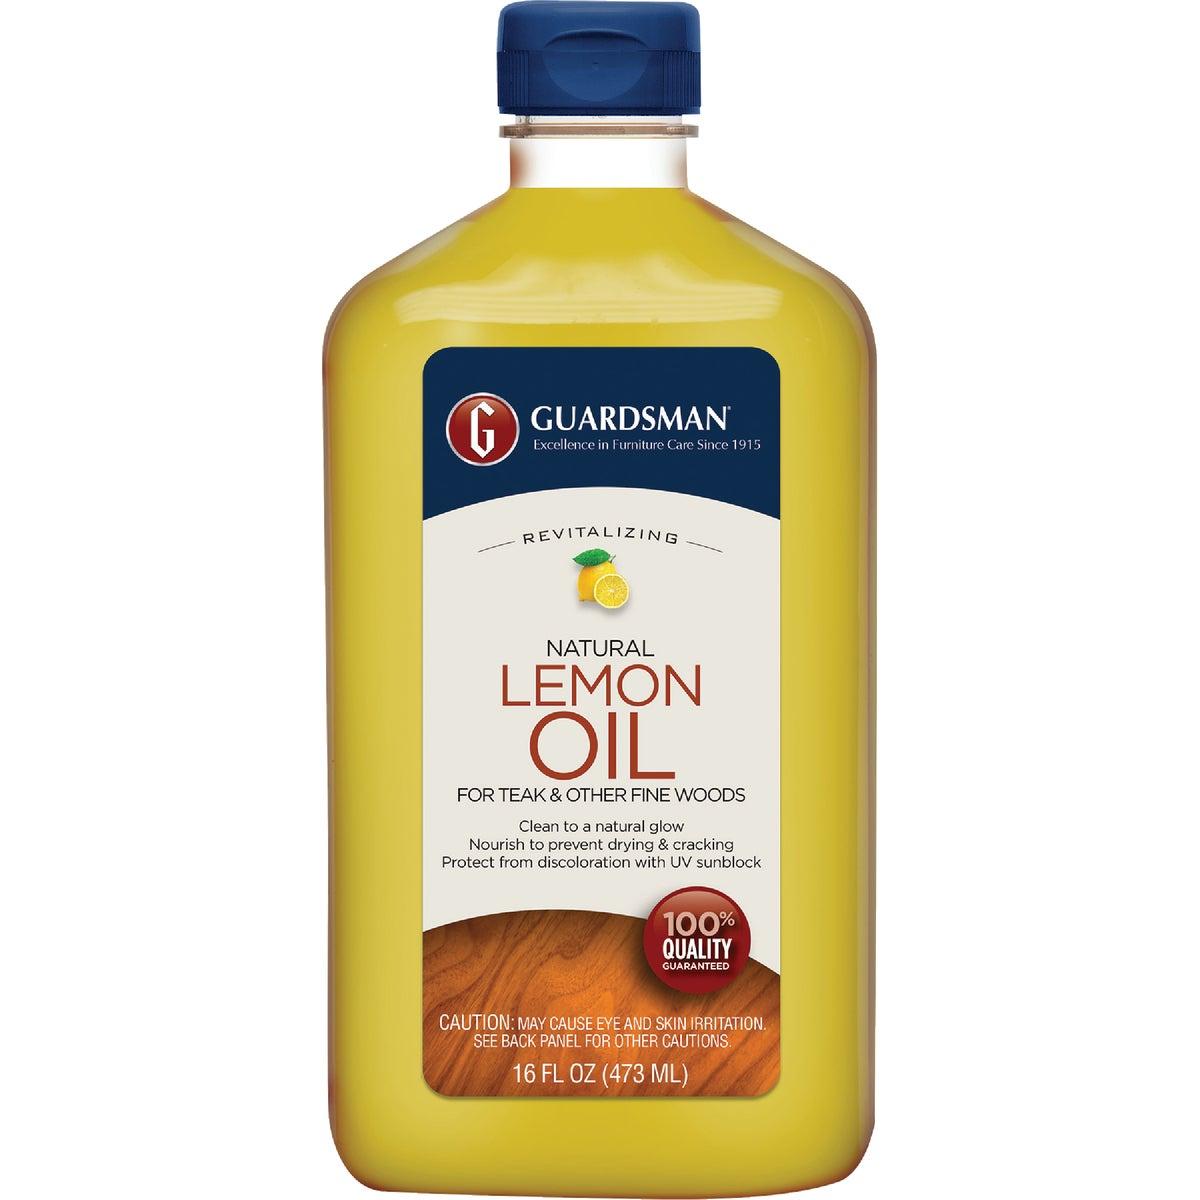 Guardsman Revitalizing Lemon Oil with UV Protection 16 oz 461700